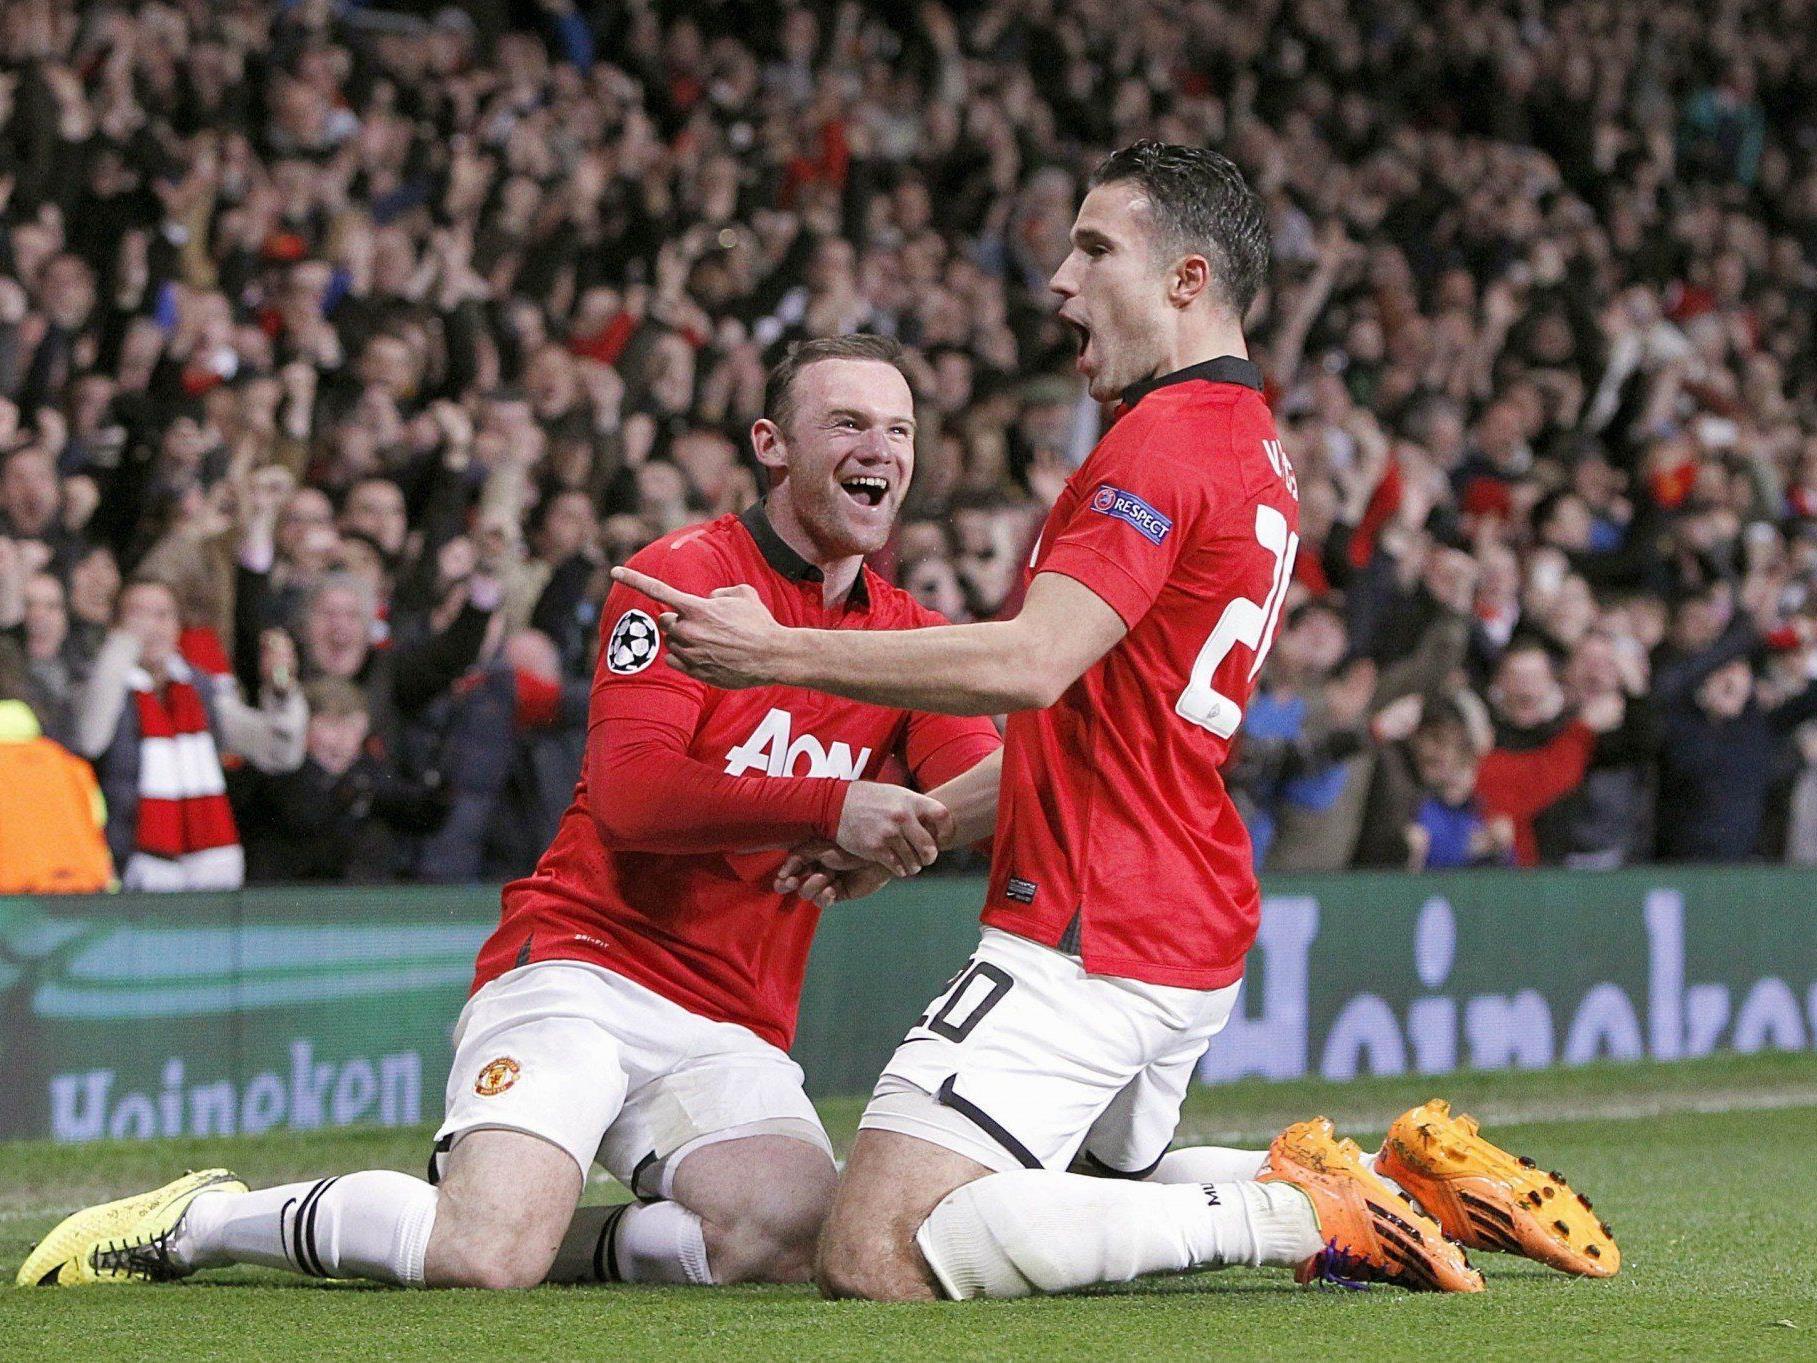 Wayne Rooney beim Torjubel mit Matchwinner Robin van Persie.